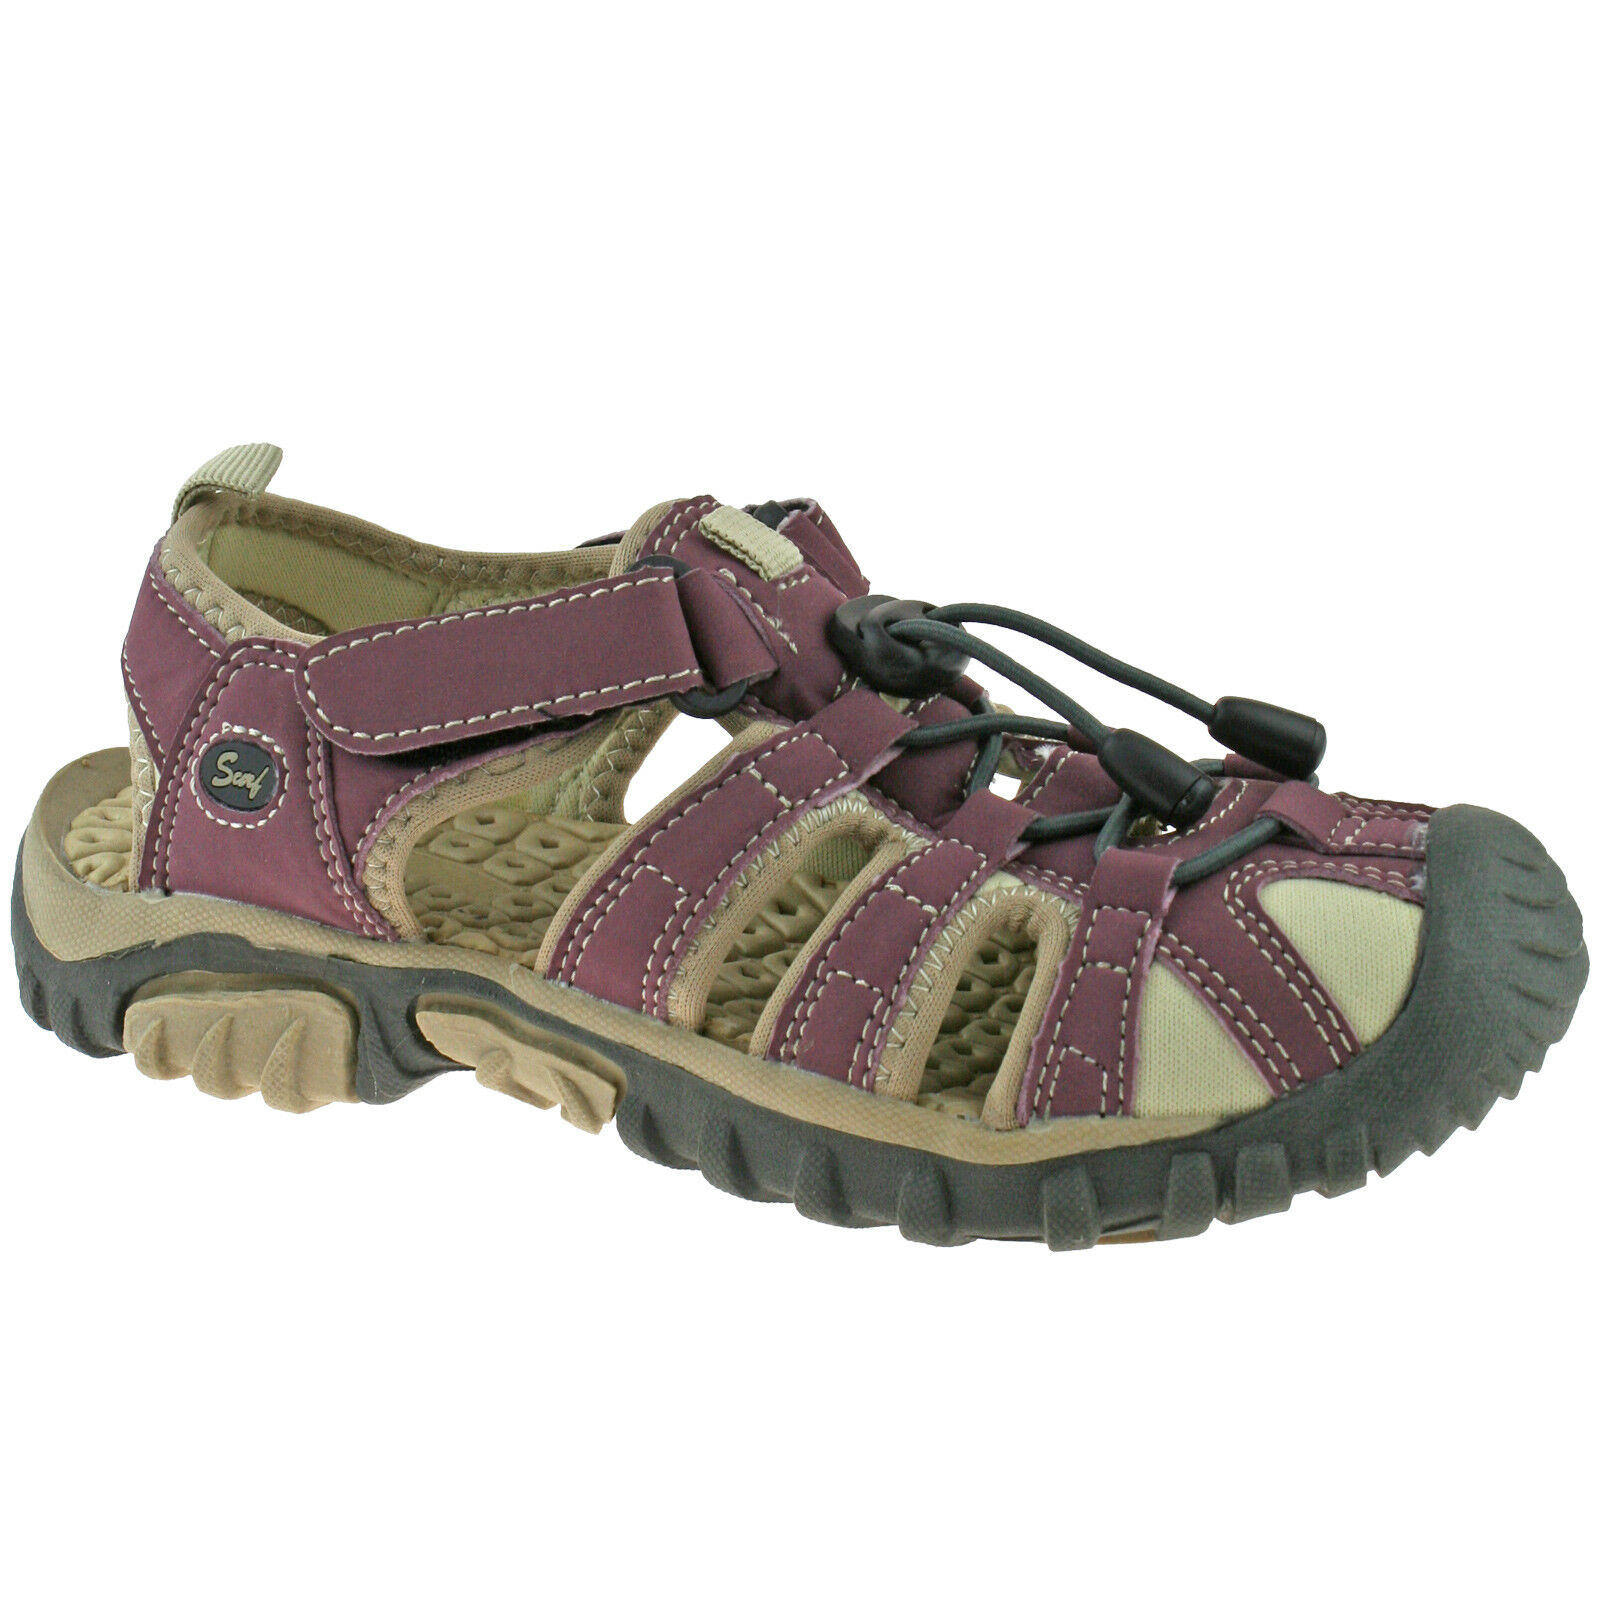 Ladies PDQ Walking Sports Enclosed Sandals Pumps Grey Blue Size 3-9 uk